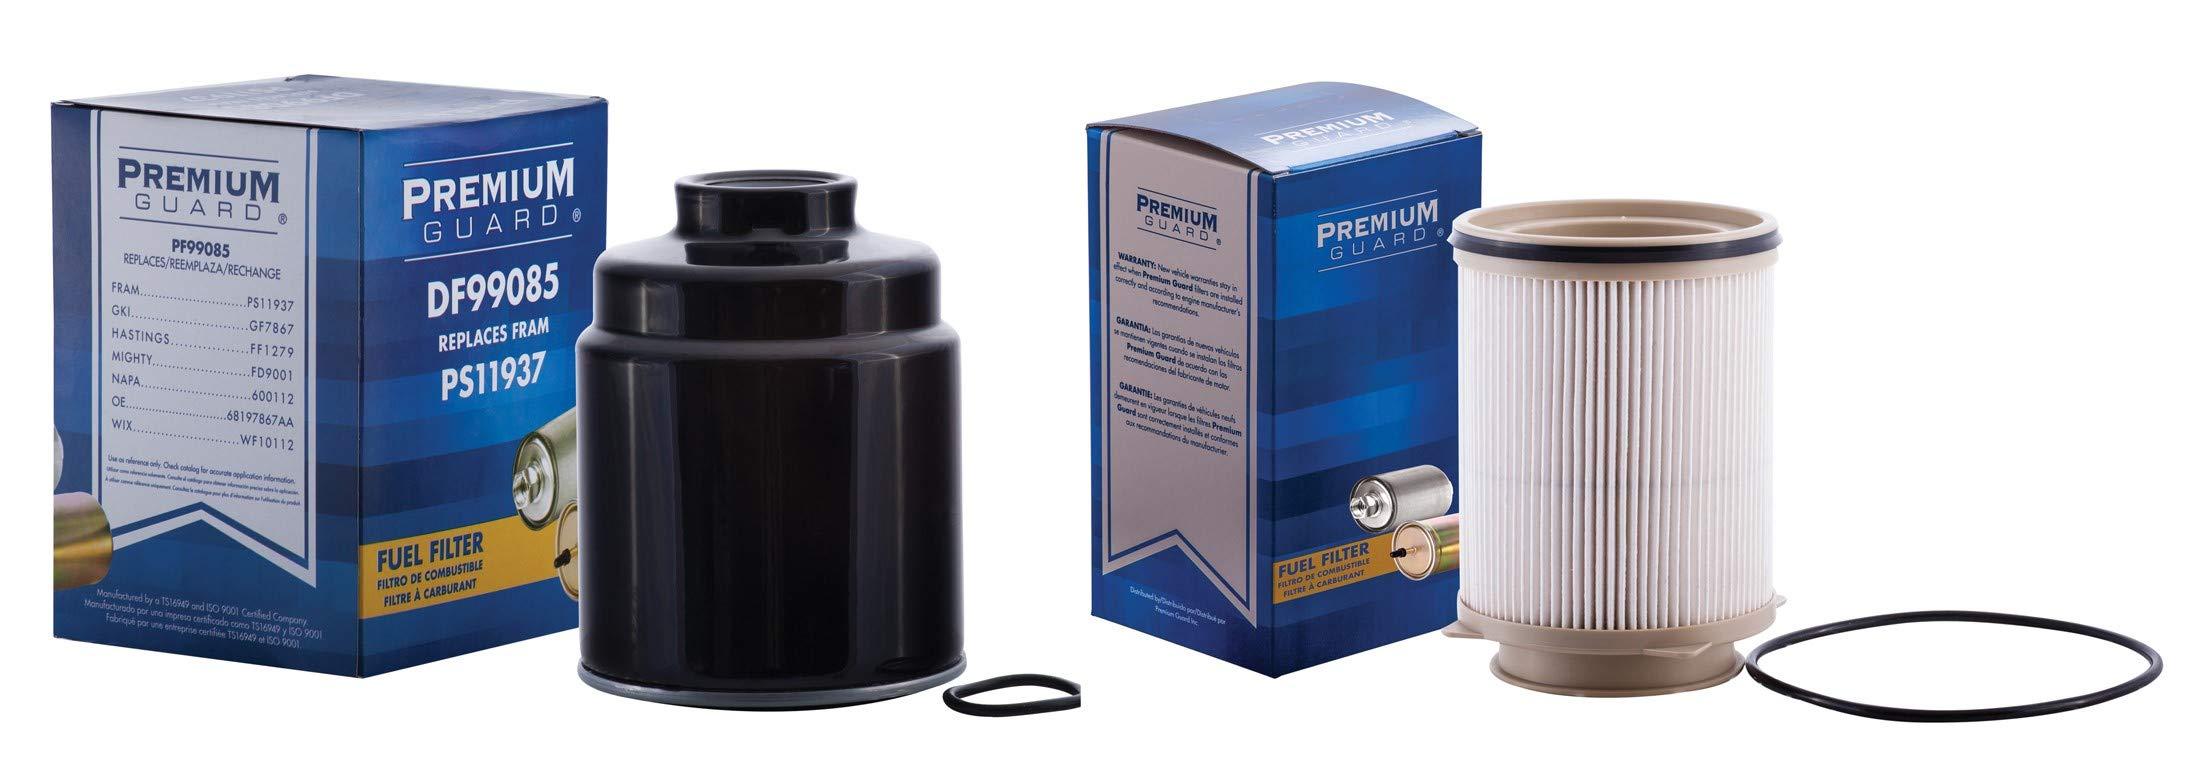 PG Kit - Diesel Fuel Filter DF6806085K| Fits 13-18 Ram 2500 6.7L; 13-18 Ram 3500 6.7L